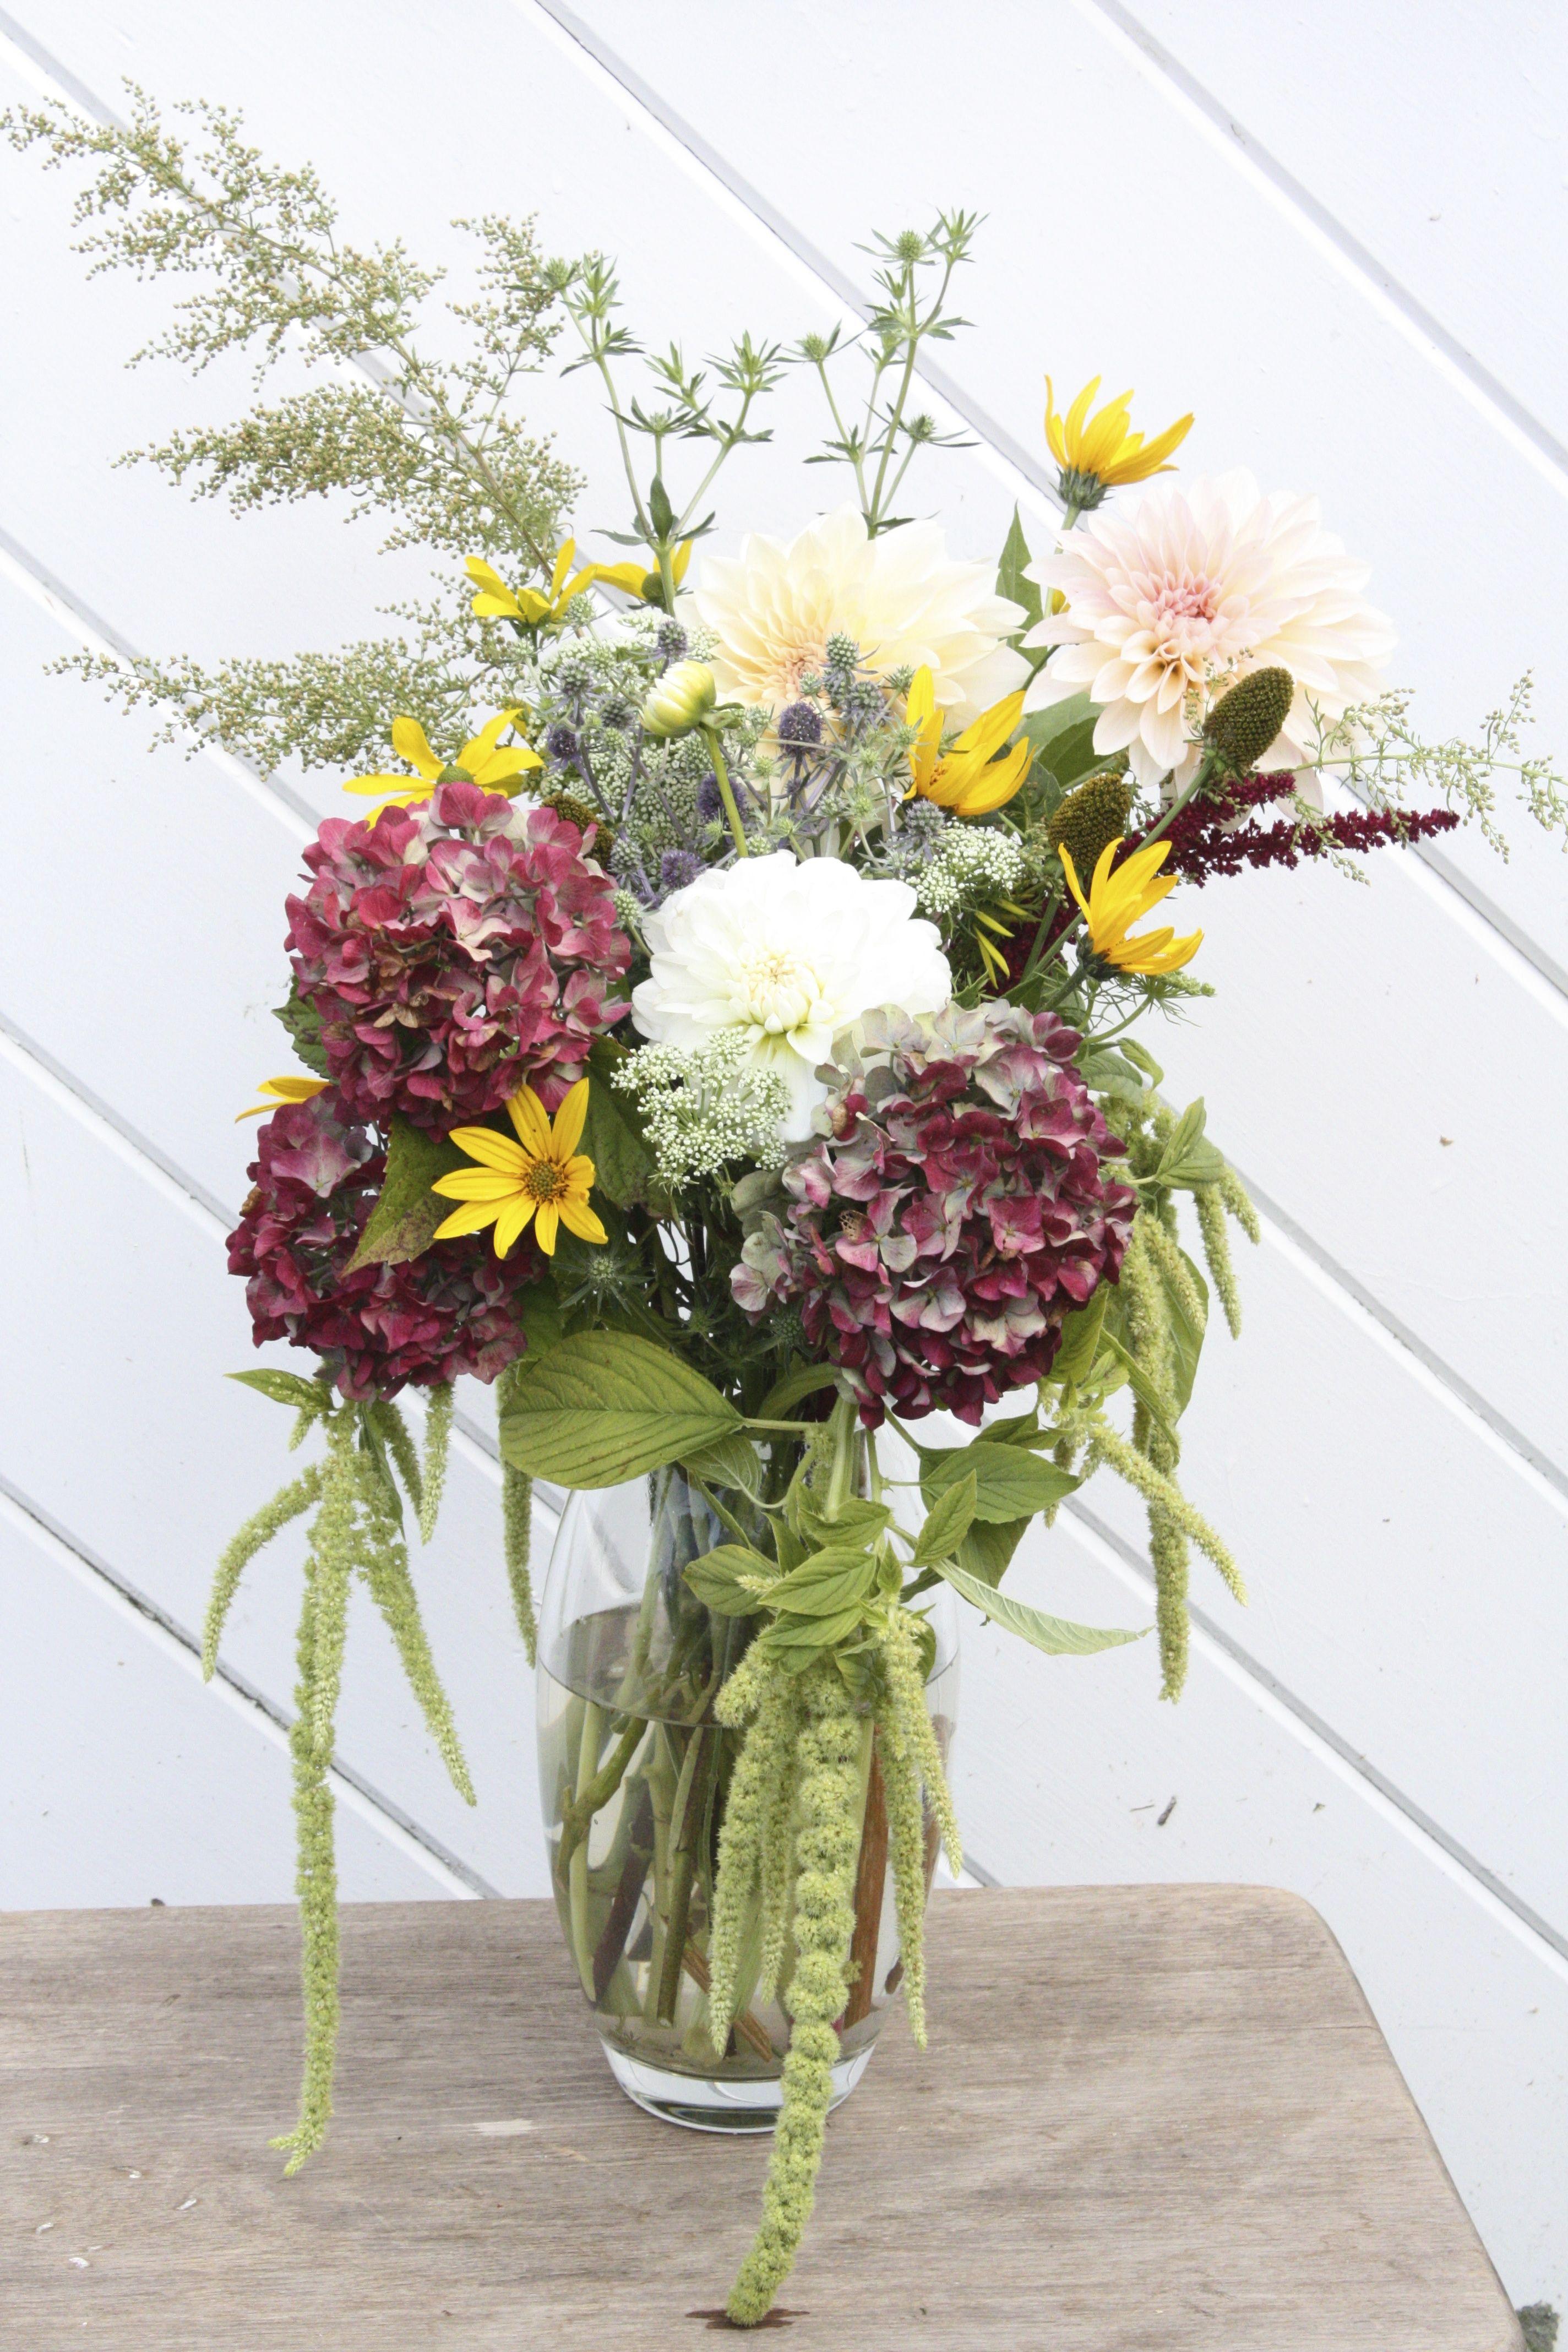 October seasonal flowers. Dahlia, hydrangea, sweet Annie